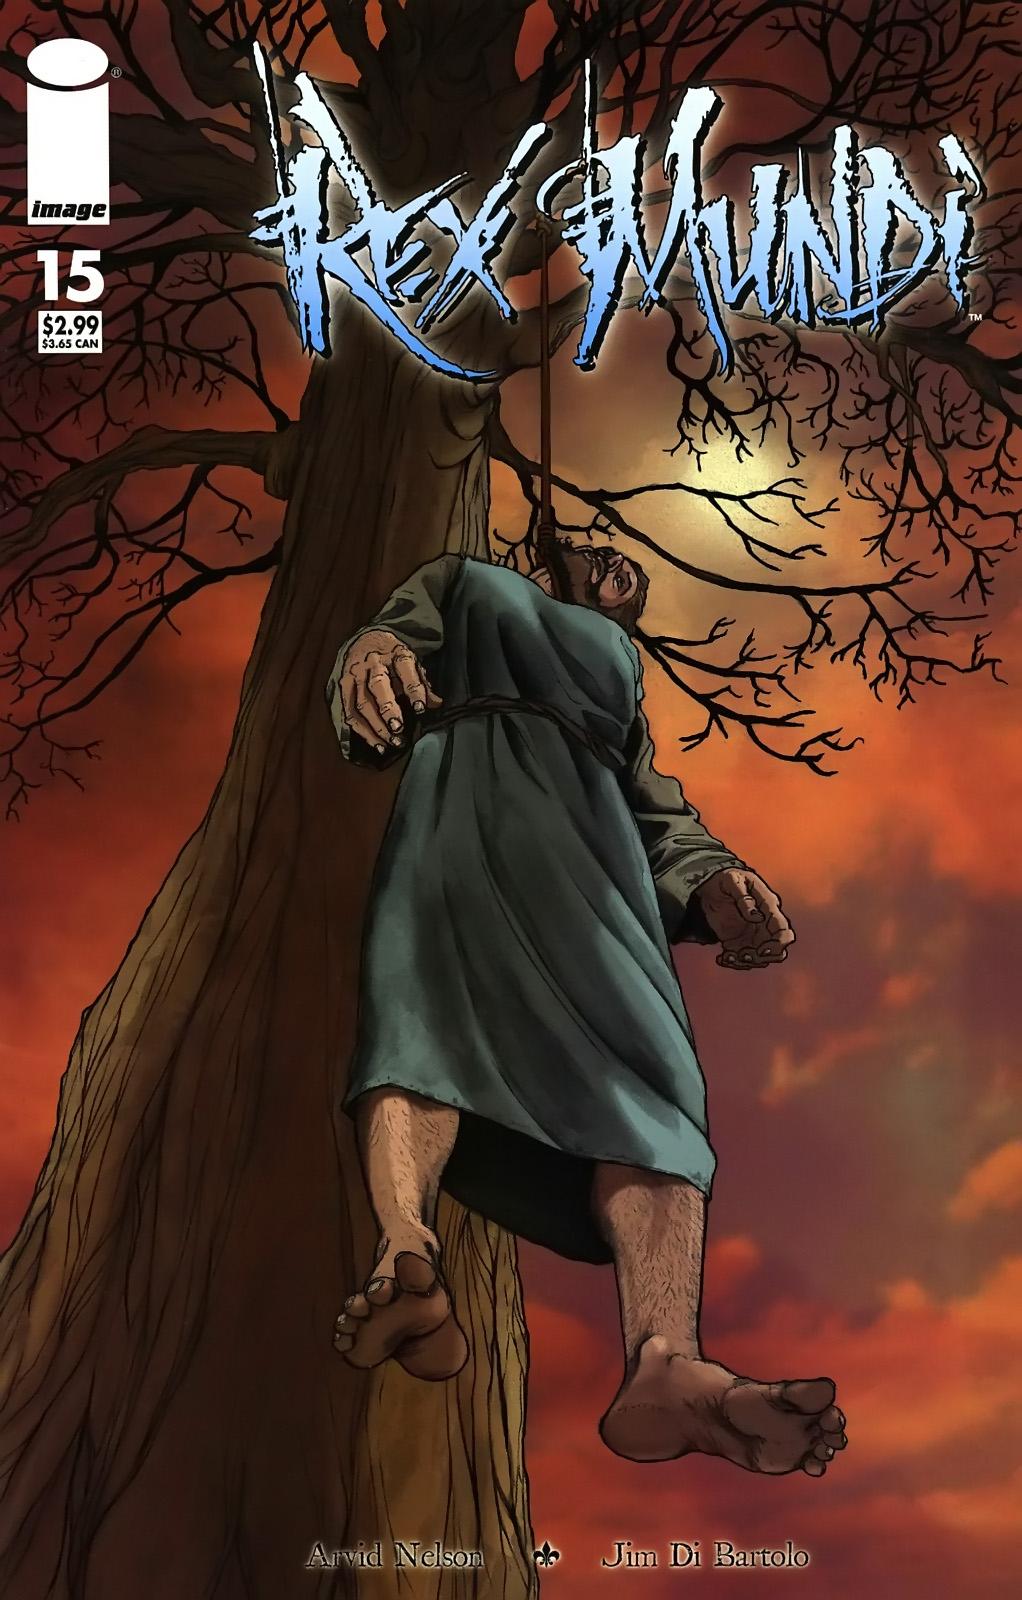 Read online Rex Mundi comic -  Issue #15 - 1